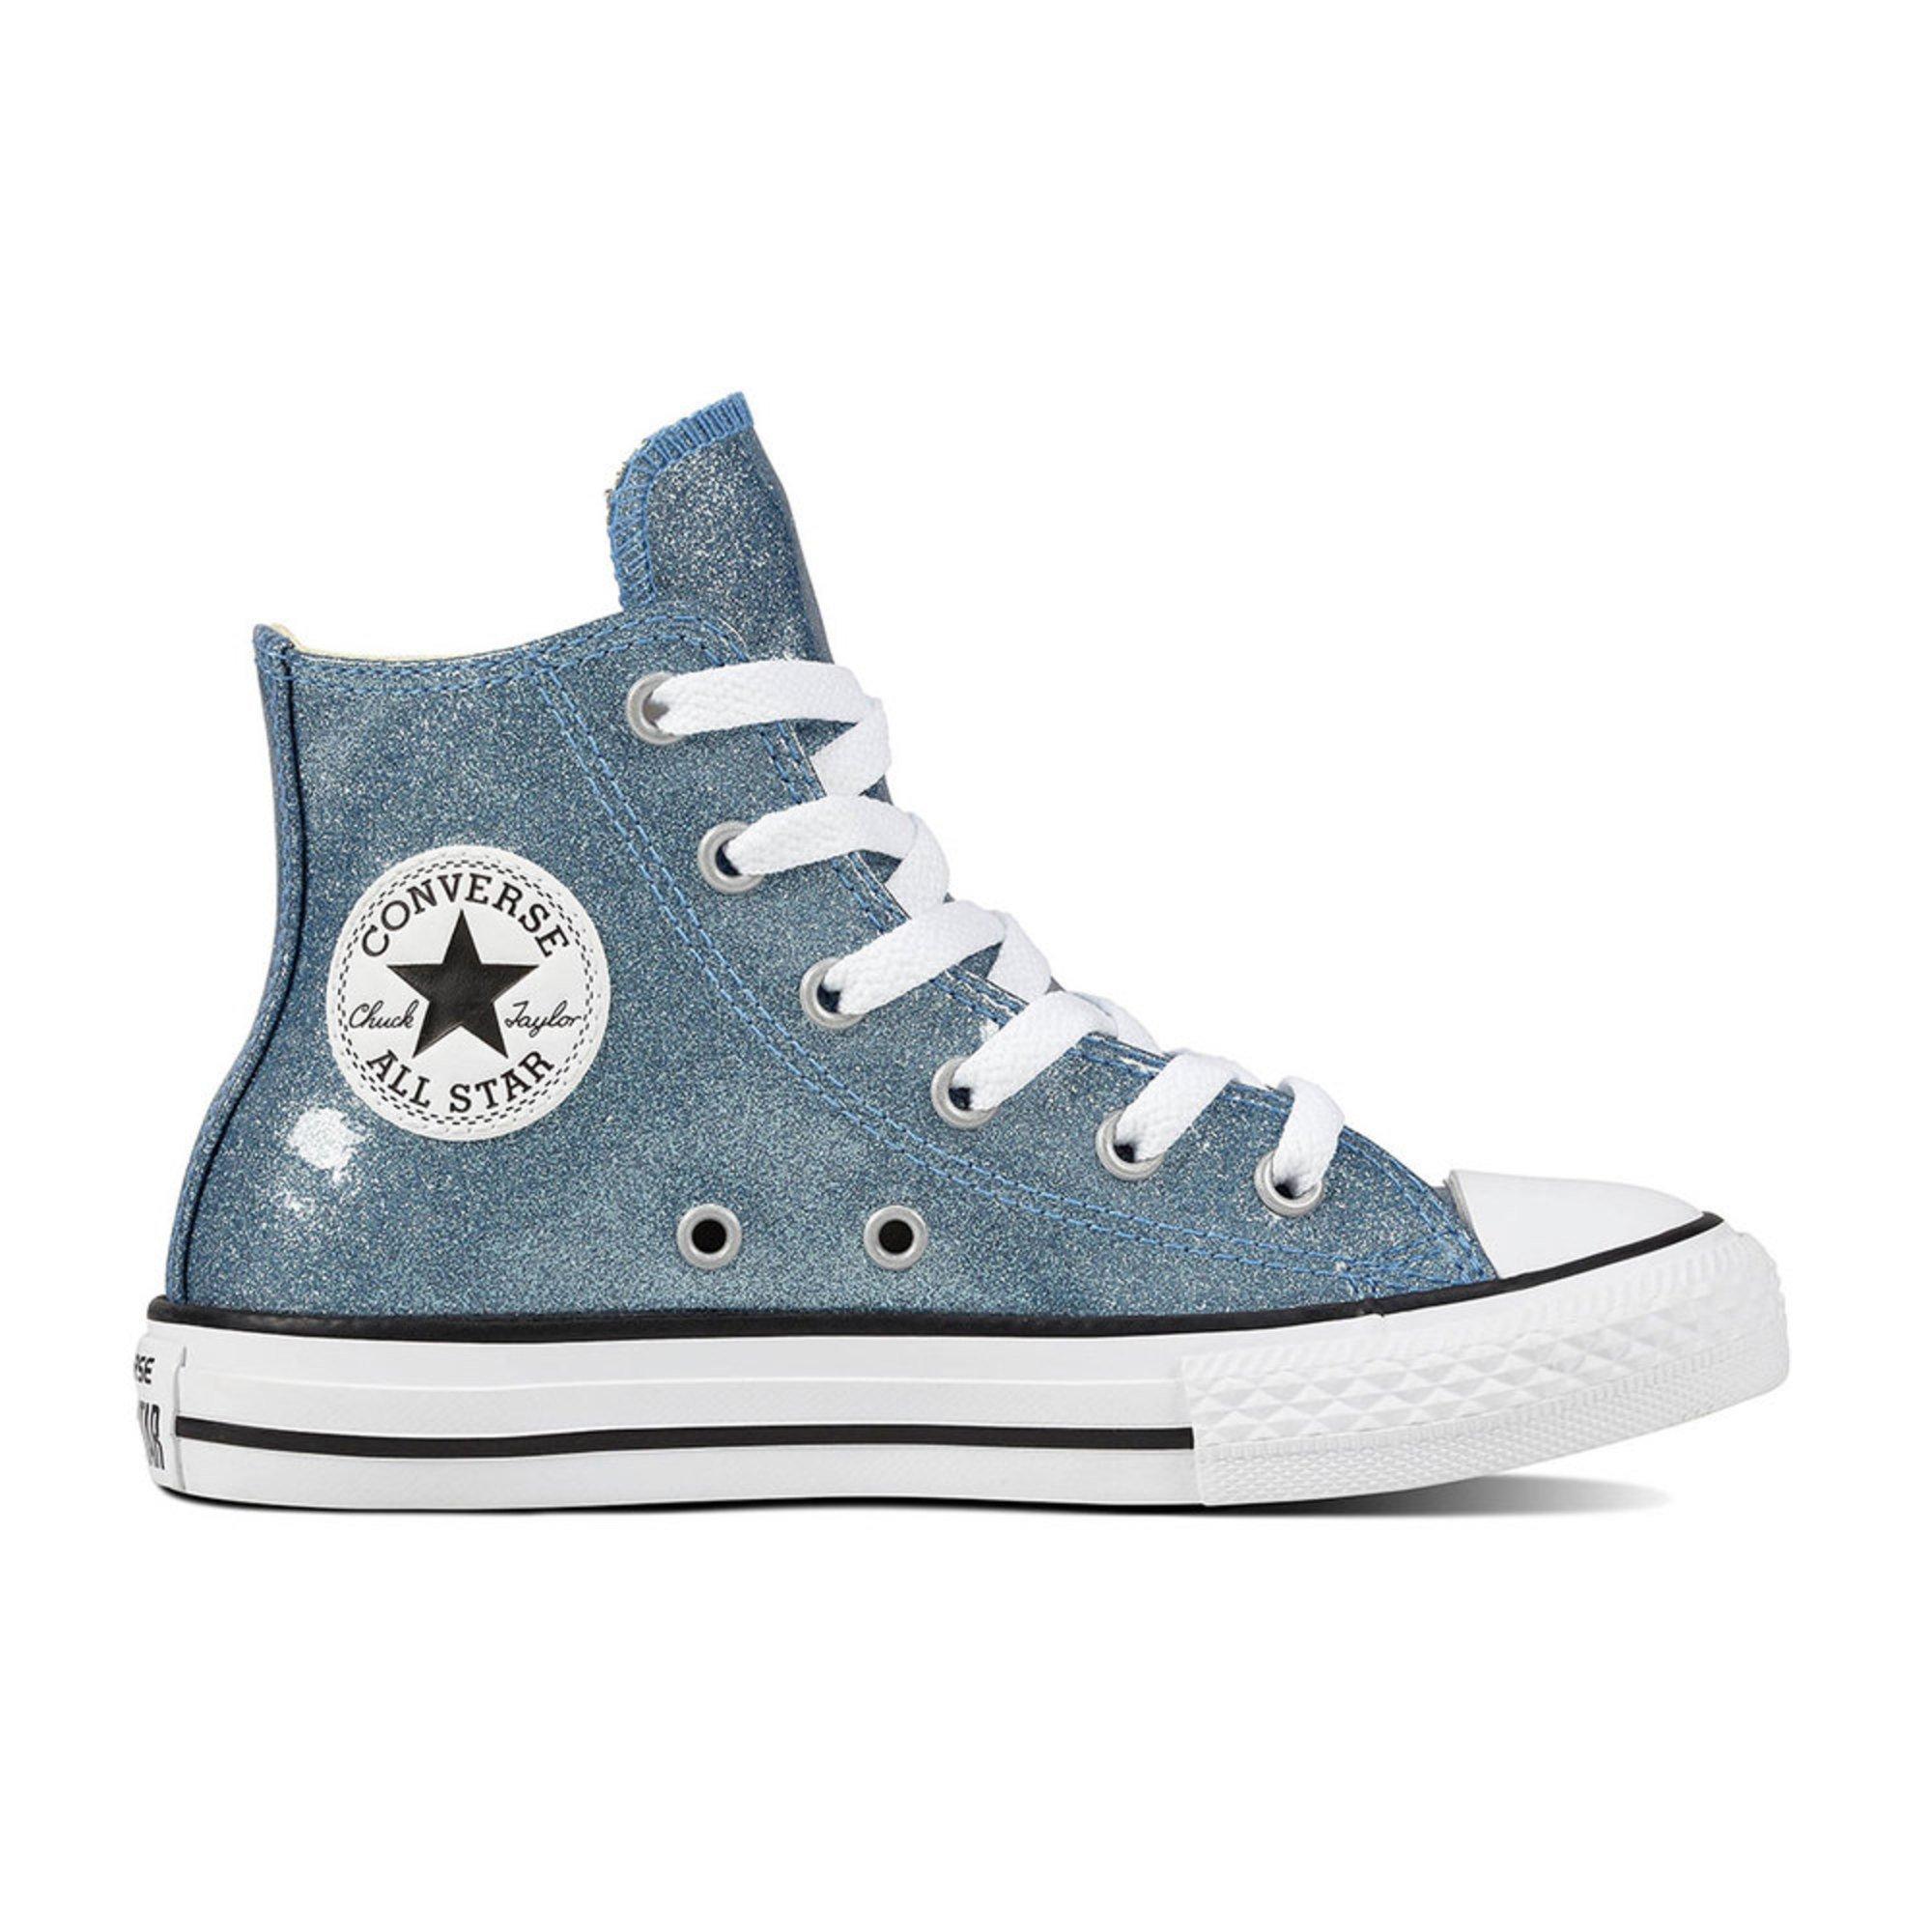 cc9dc6b813c200 ... denmark converse girls chuck taylor all star autumn glitter hi top  sneaker eb5e5 a803e